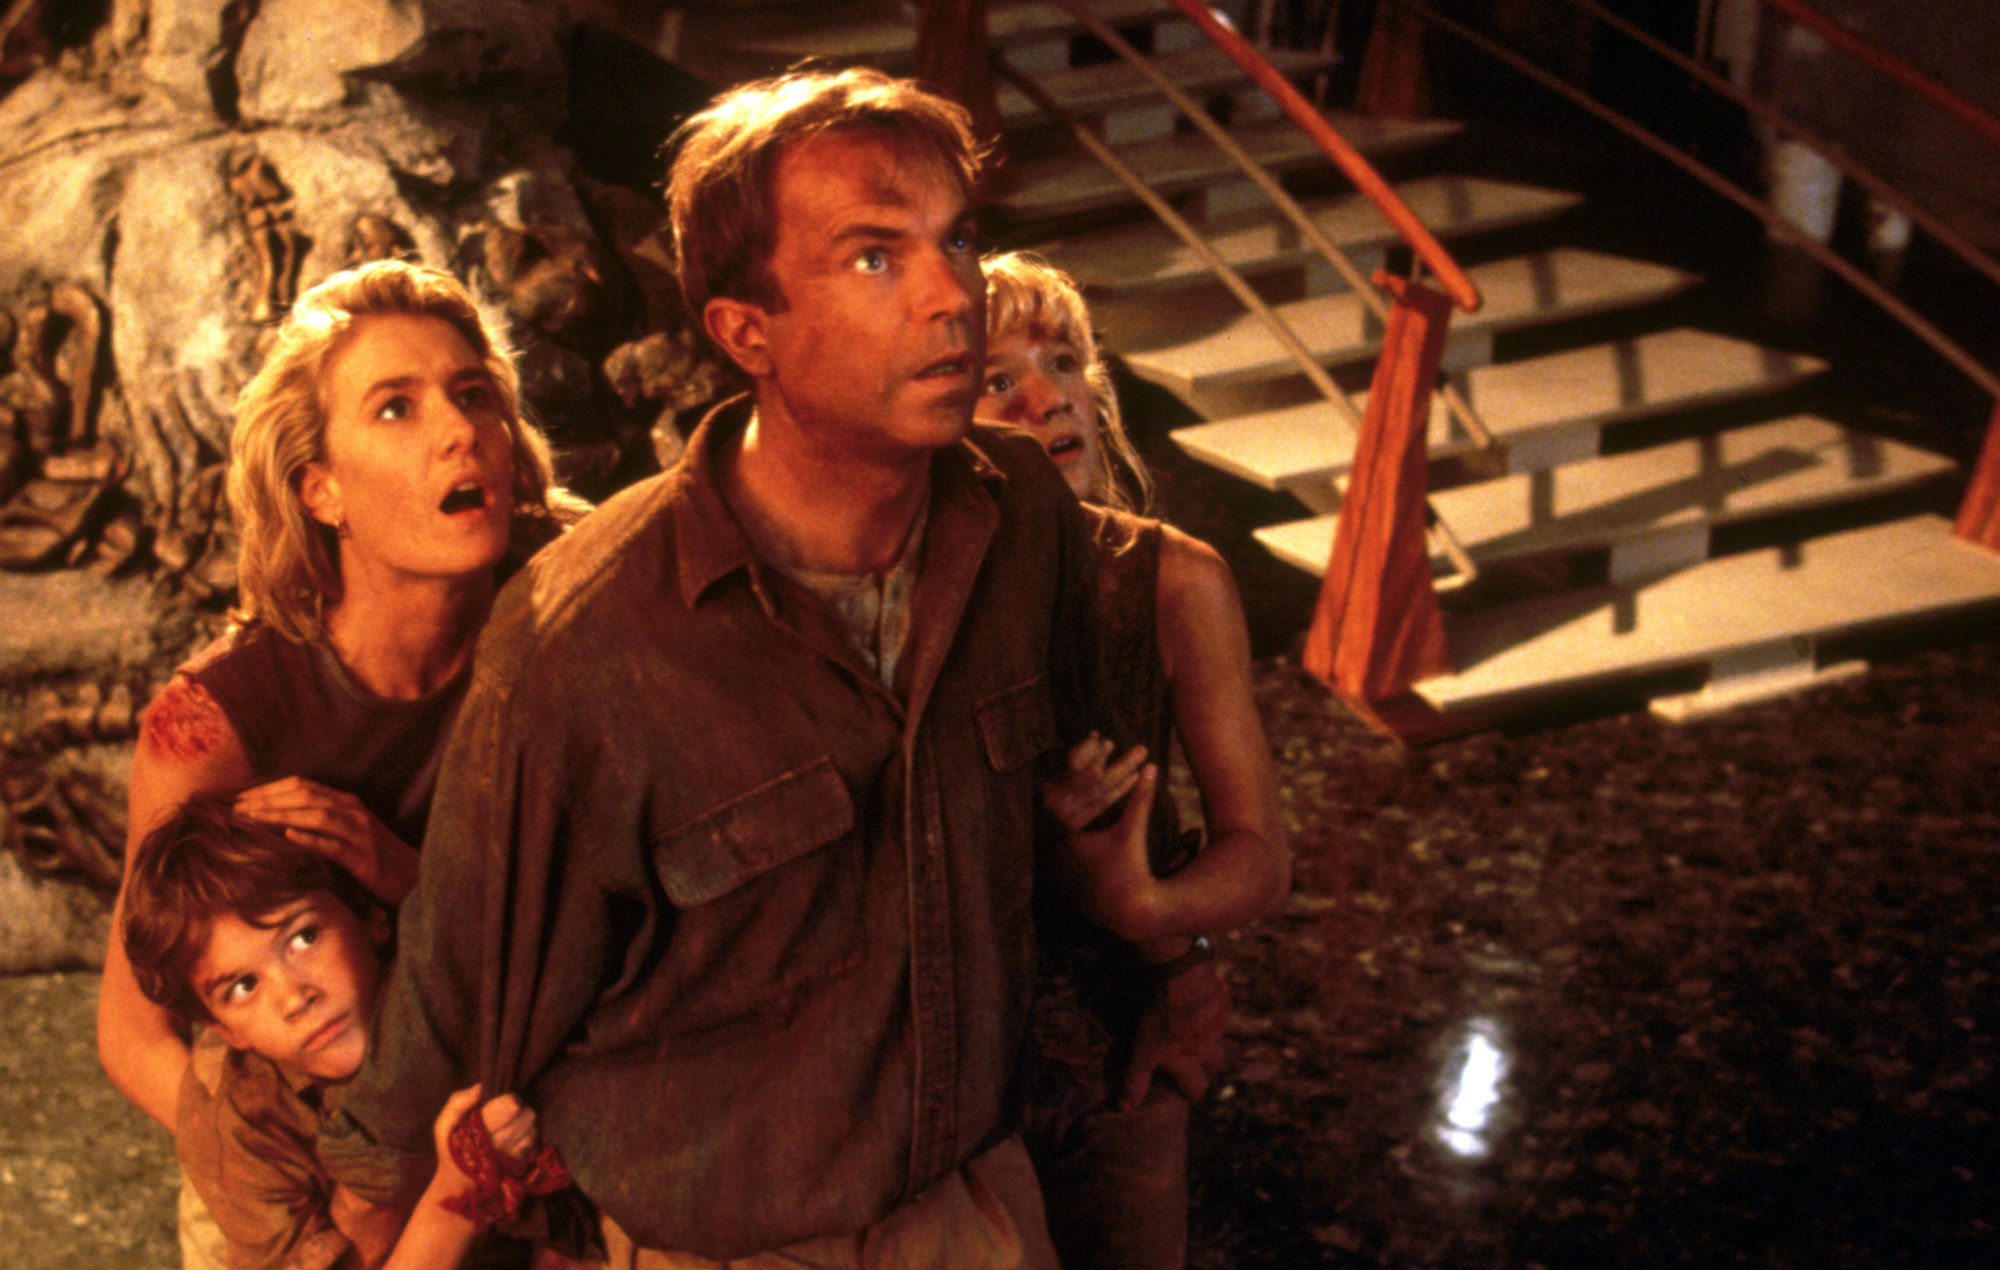 The original Jurassic Park cast have held a mini-reunion